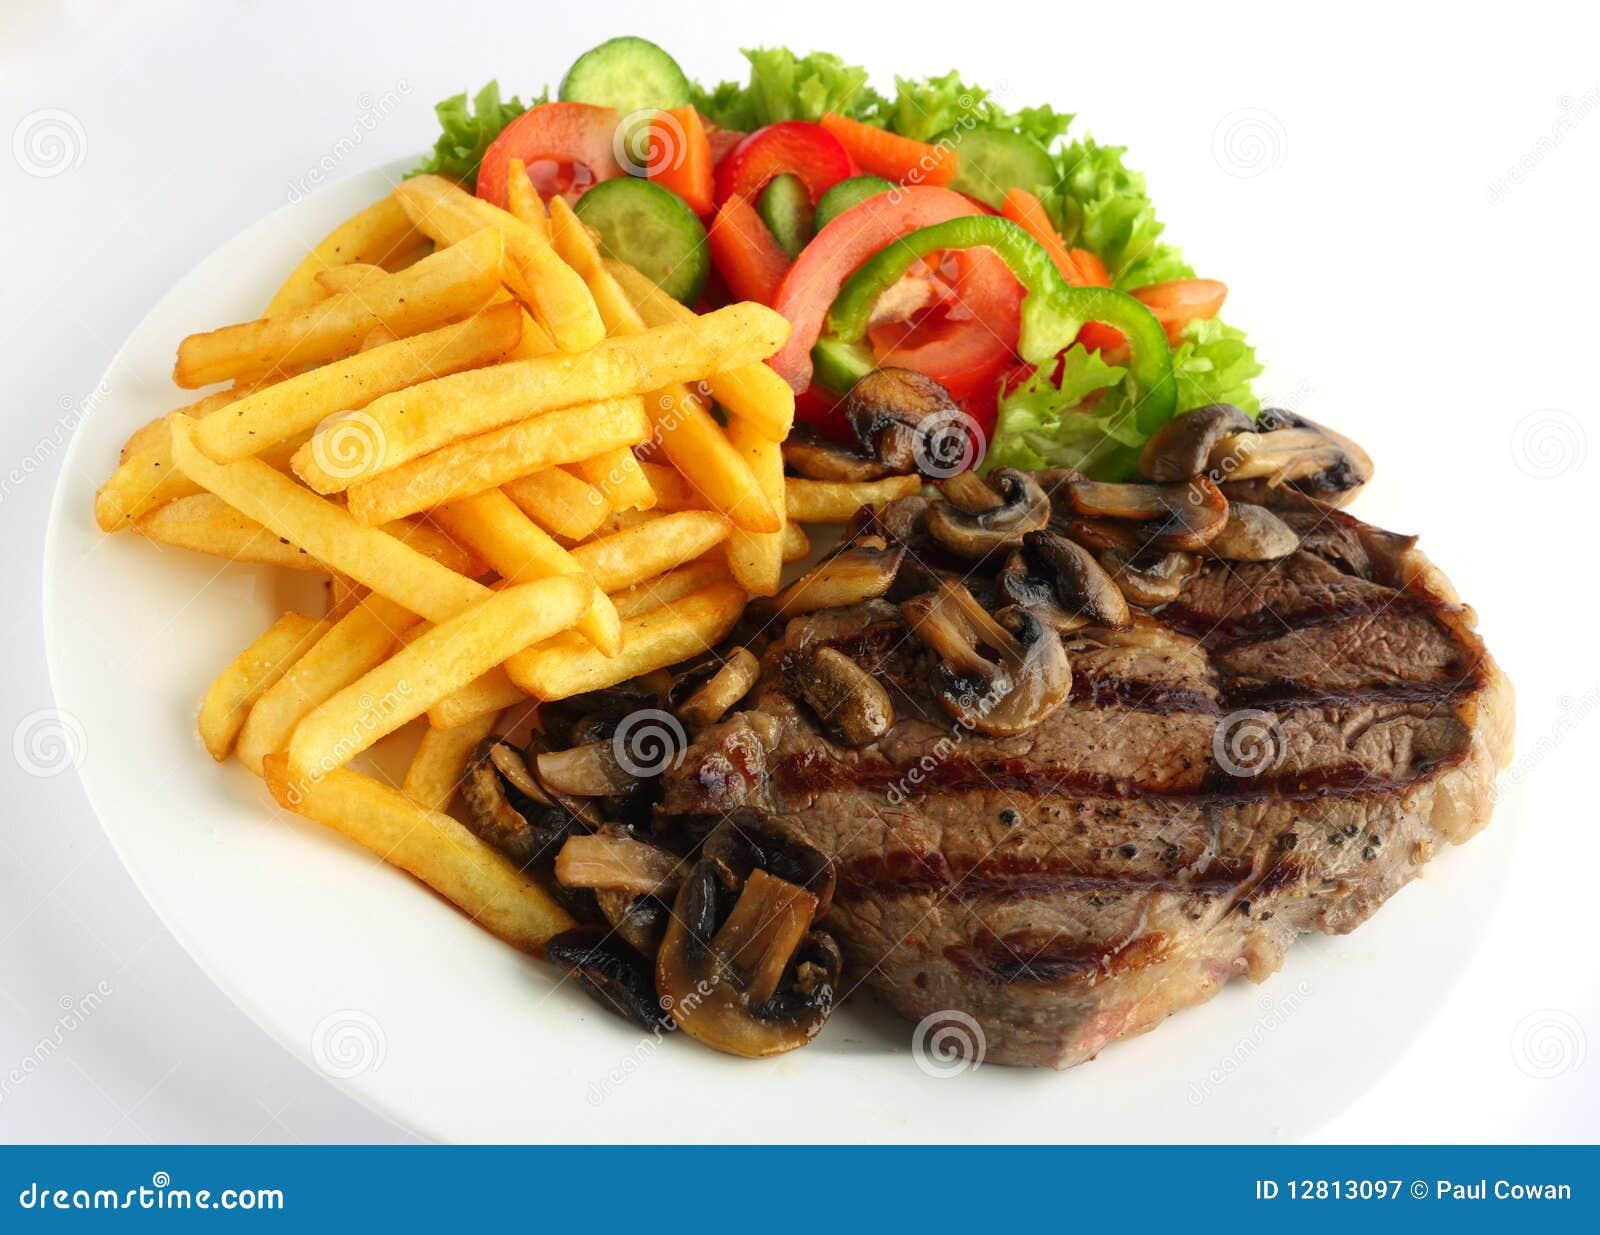 how to prepare ribeye steak